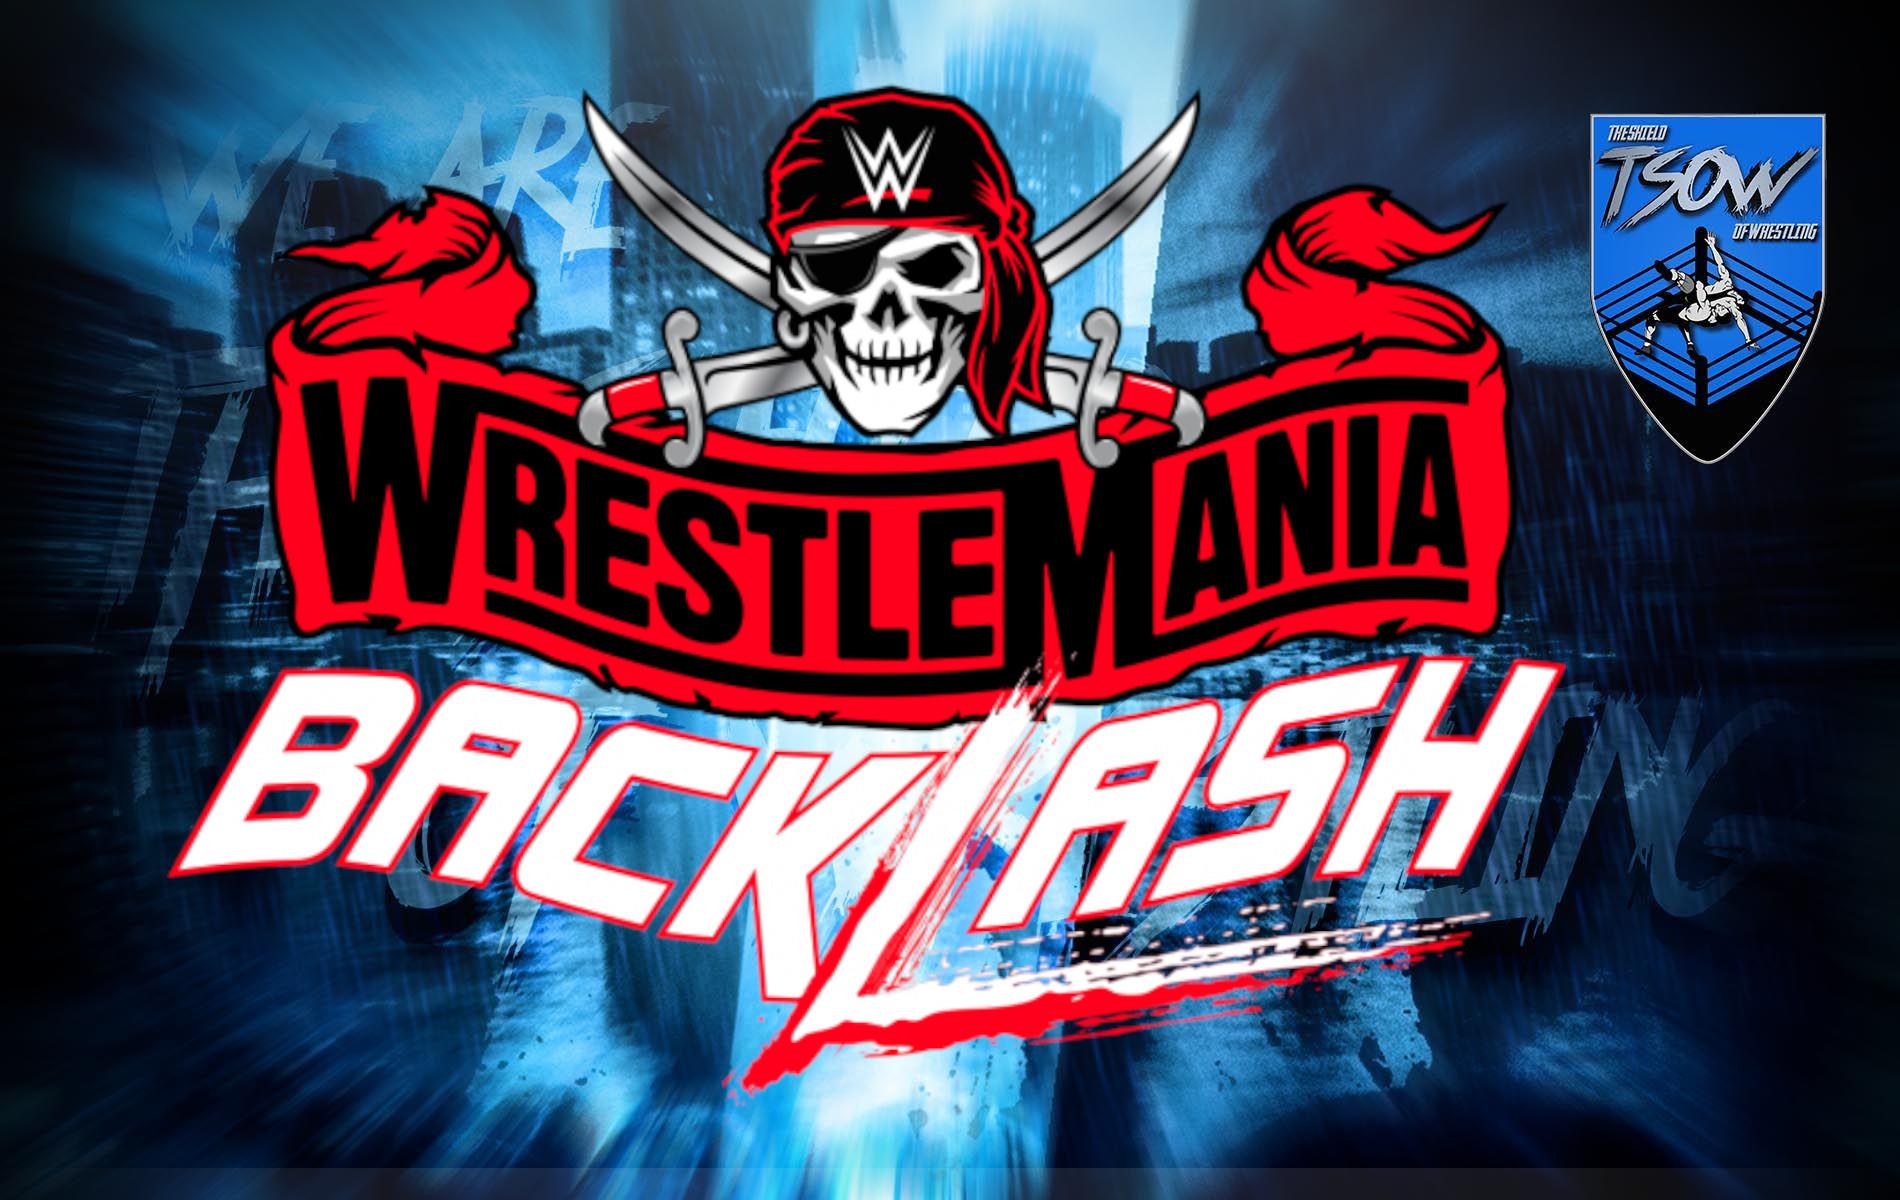 Roman Reigns vs Cesaro annunciato per WrestleMania Backlash